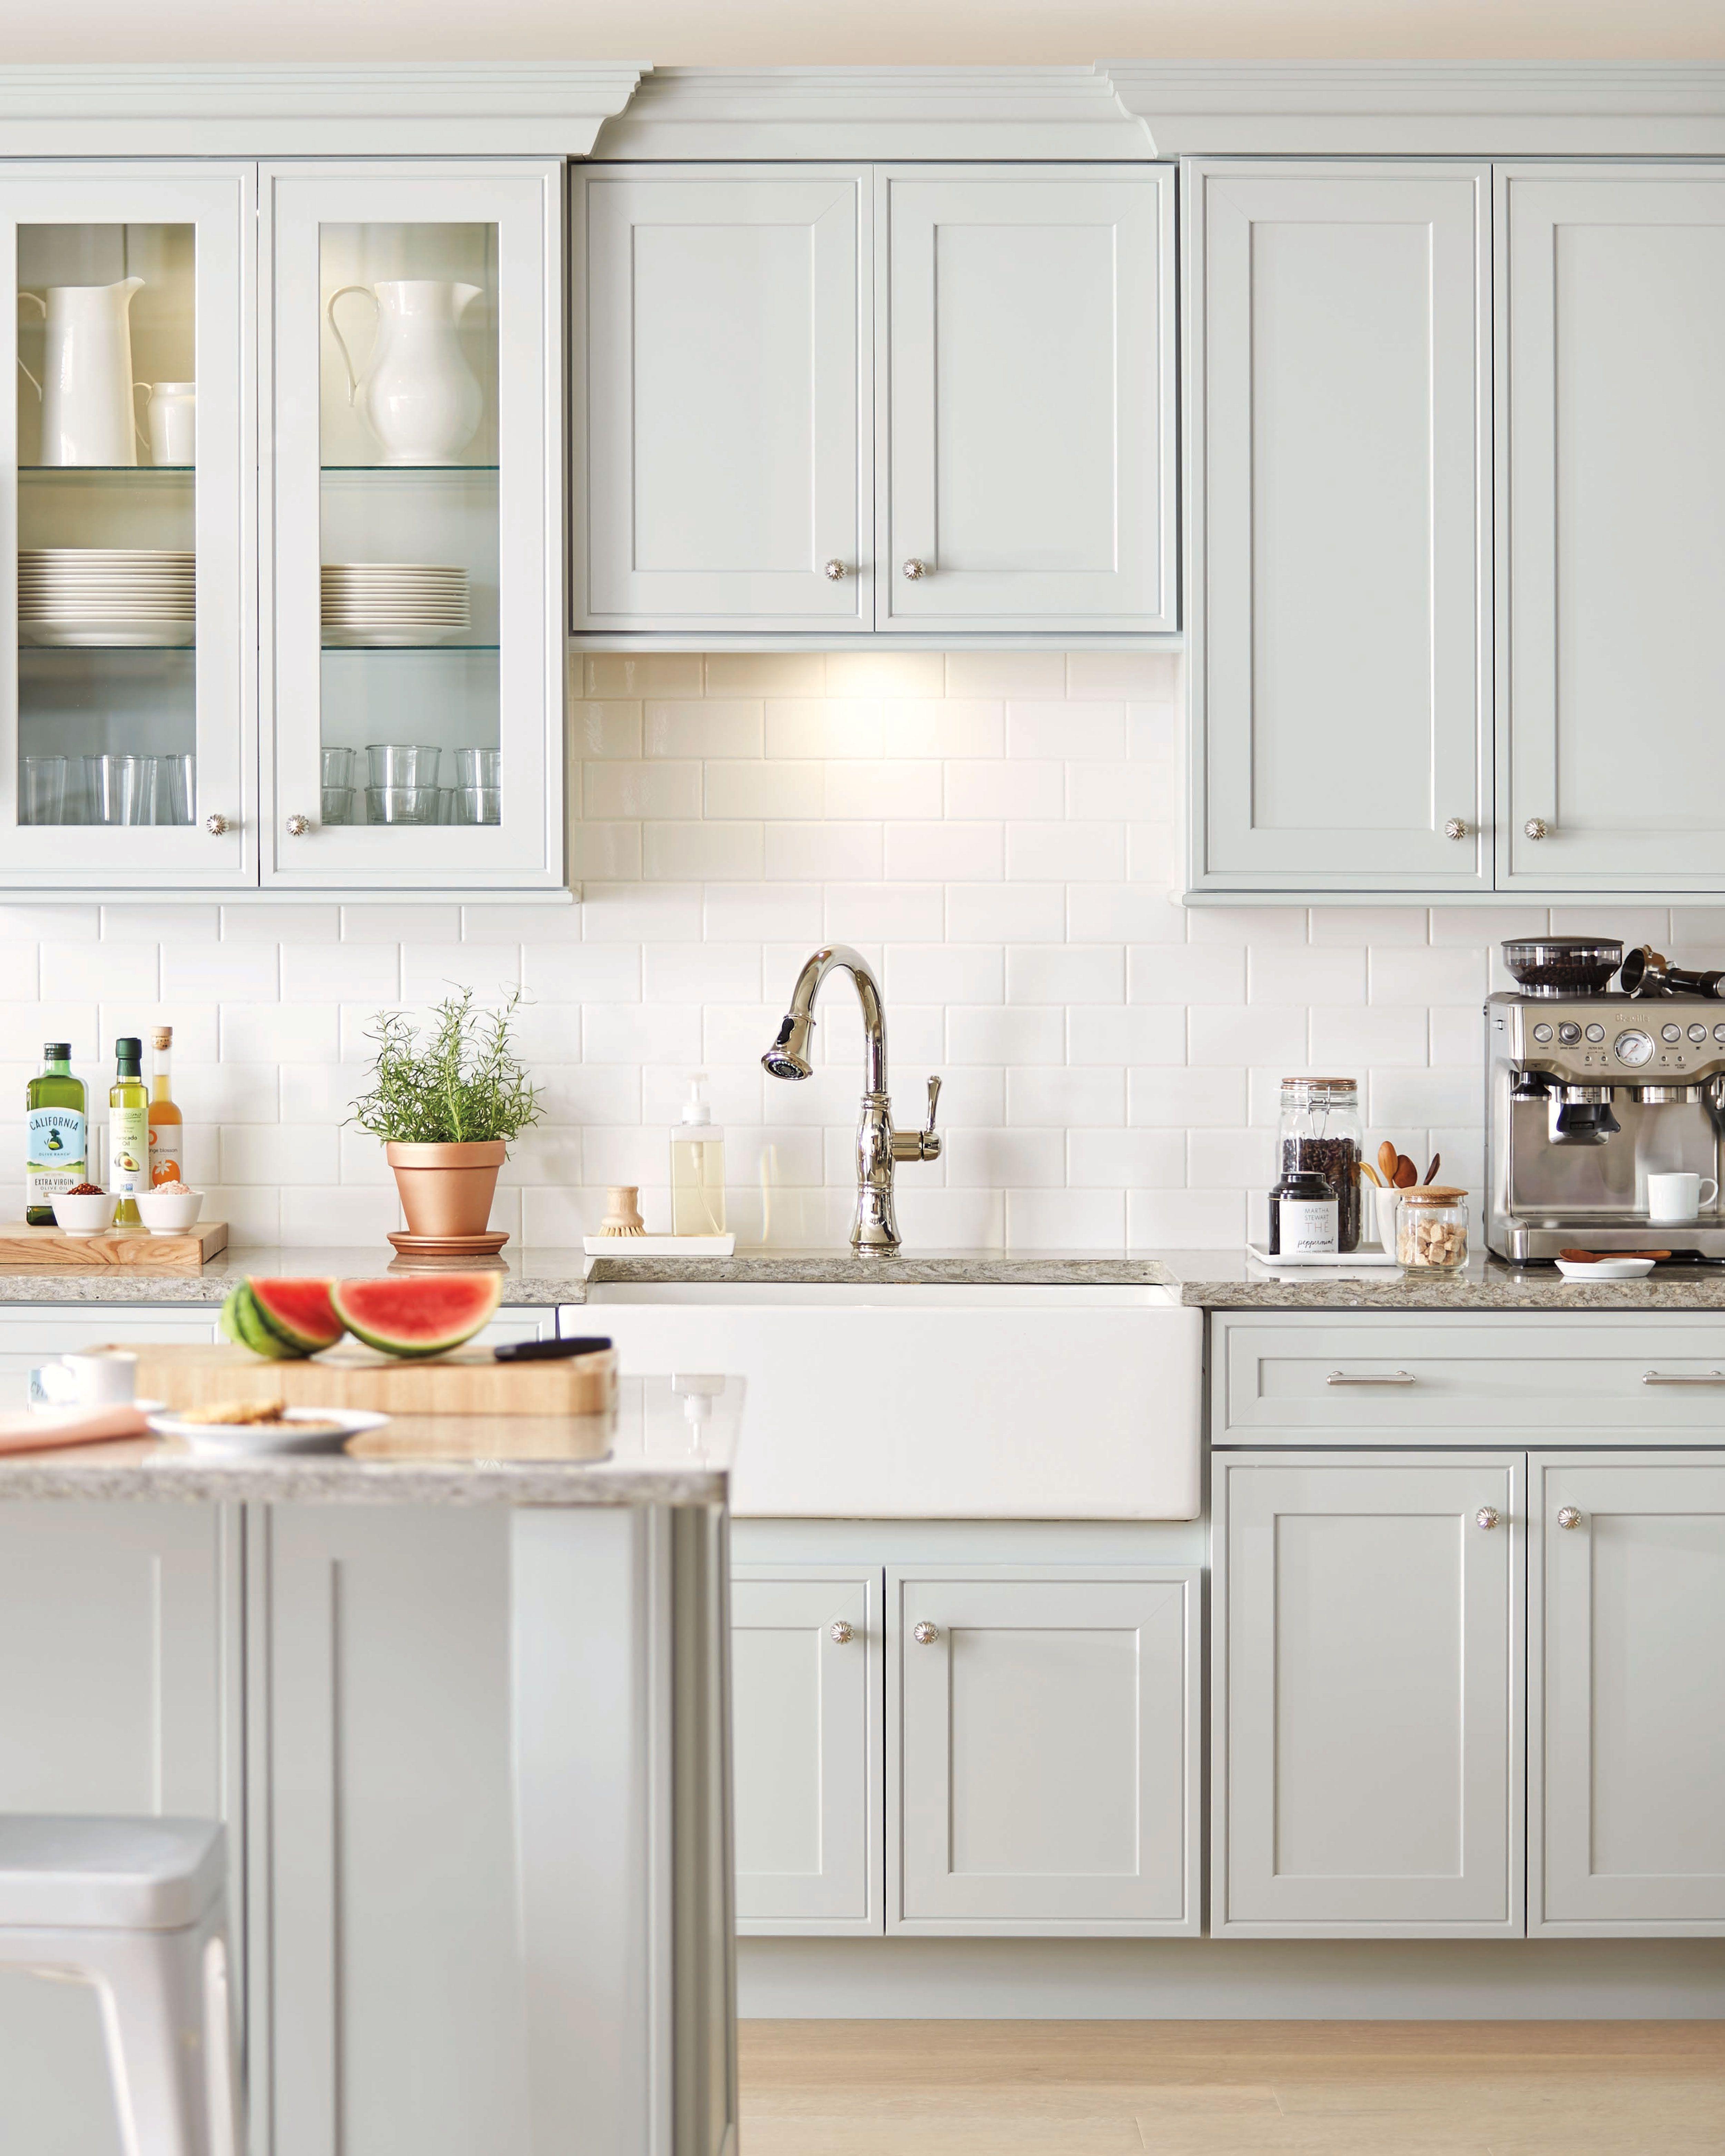 11 Common Kitchen Renovation Mistakes To Avoid Kitchen Design Home Depot Kitchen Kitchen Renovation